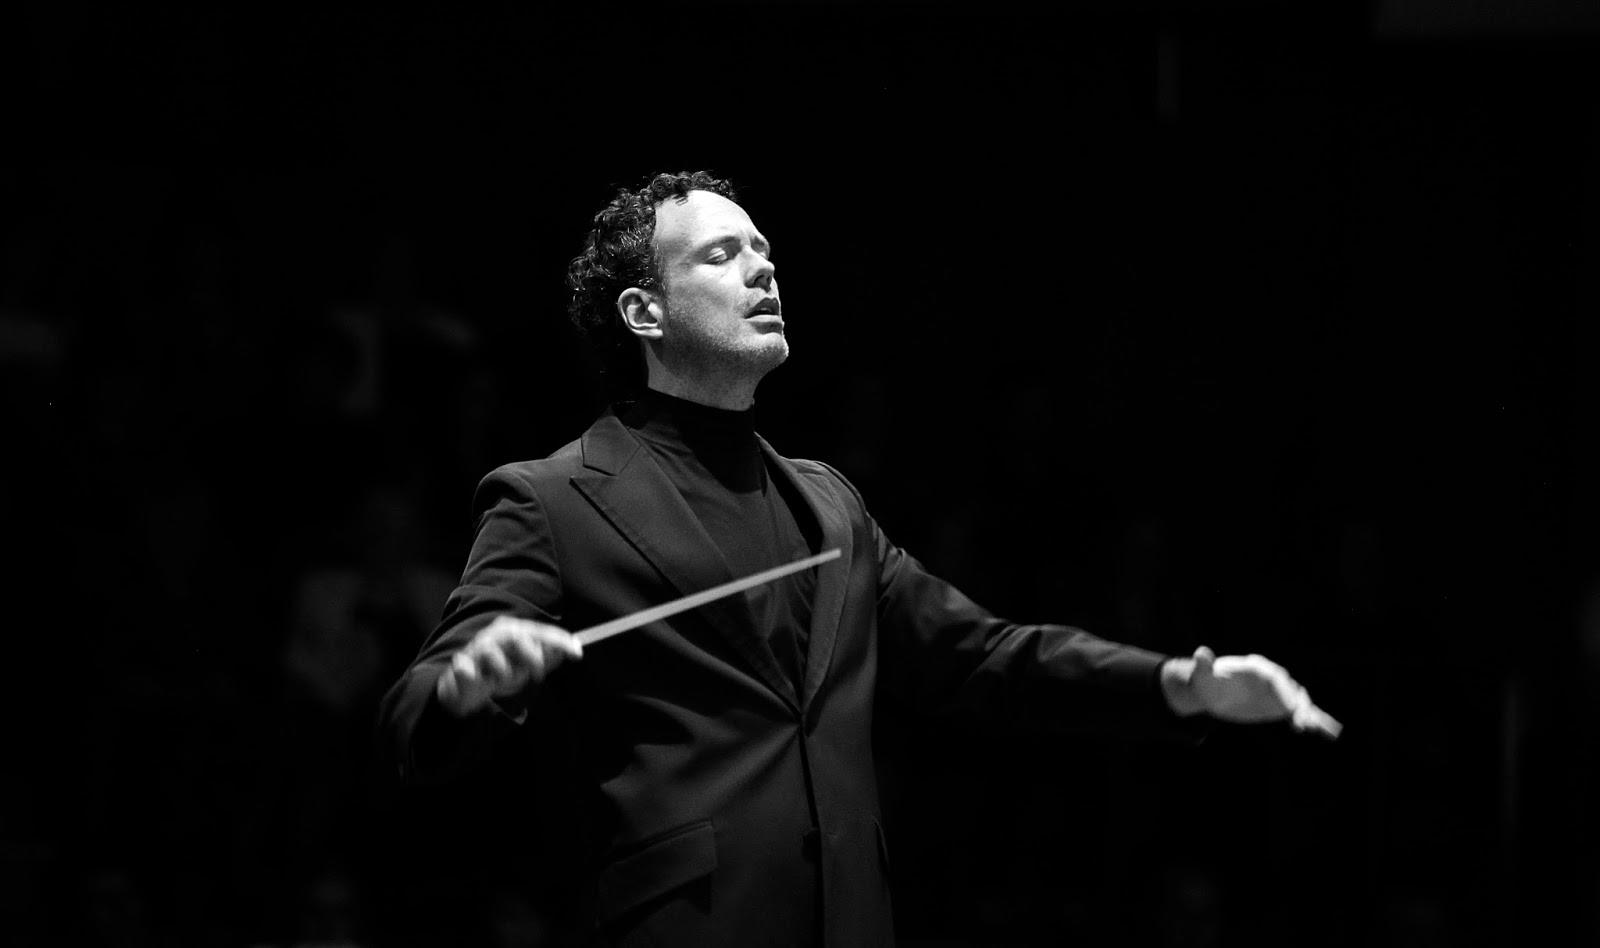 Aleksandar Marković named as new music director of Opera North